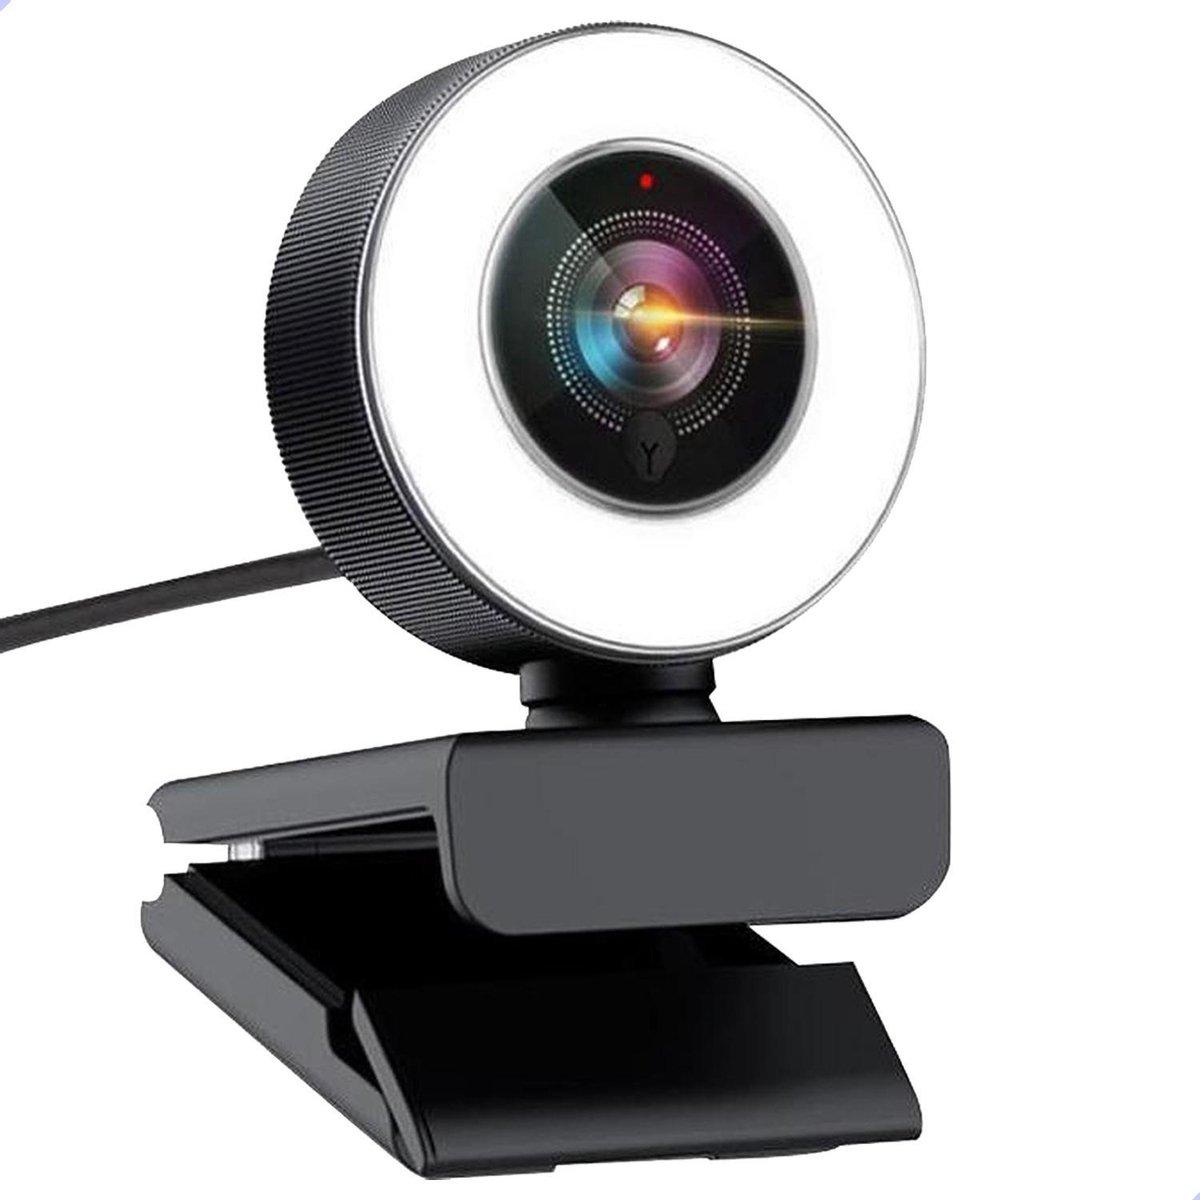 Ringlight Webcam met microfoon - Full HD - AutoFocus - 2K - Ringlicht - Plug & Play - Windows/Mac - LED - USB - Vergaderingscamera - Zoom - Teams - Youtube - Tiktok - Streaming - Twitch - Facebook- Instagram - 2021